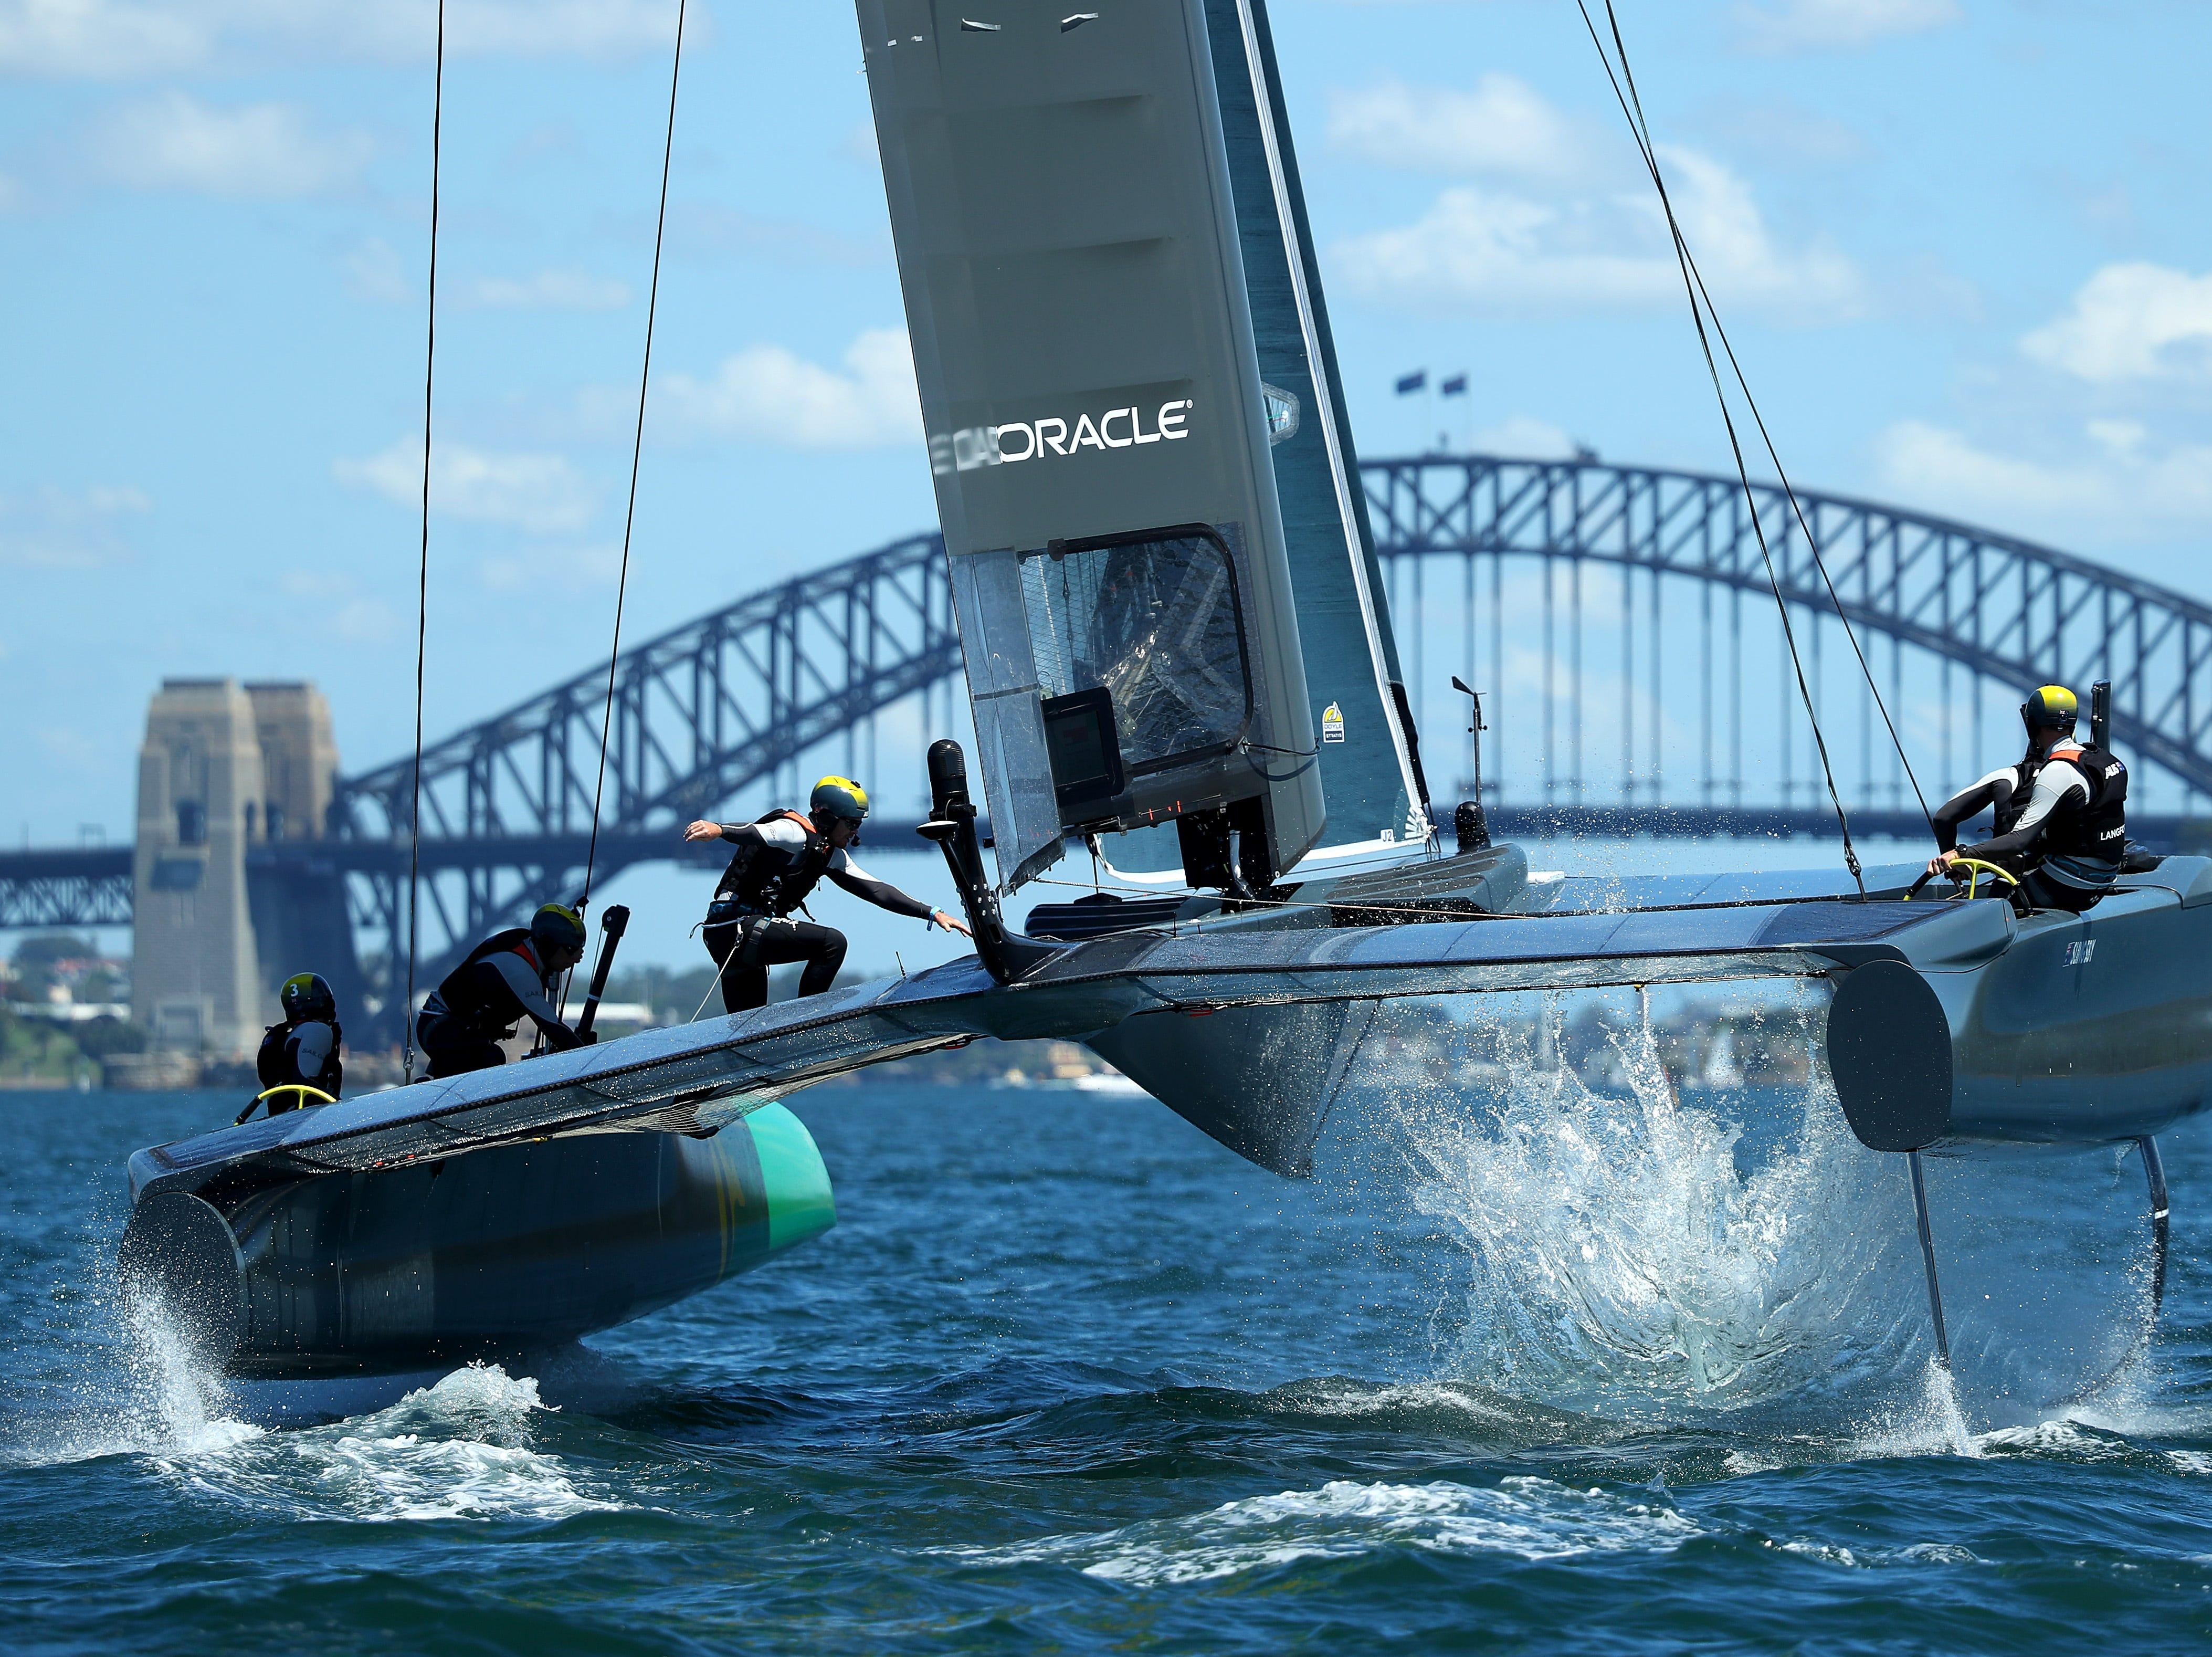 The Australian SailGP team races through Sydney Harbour during practice ahead of SailGP on Feb. 7, 2019 in Sydney, Australia.